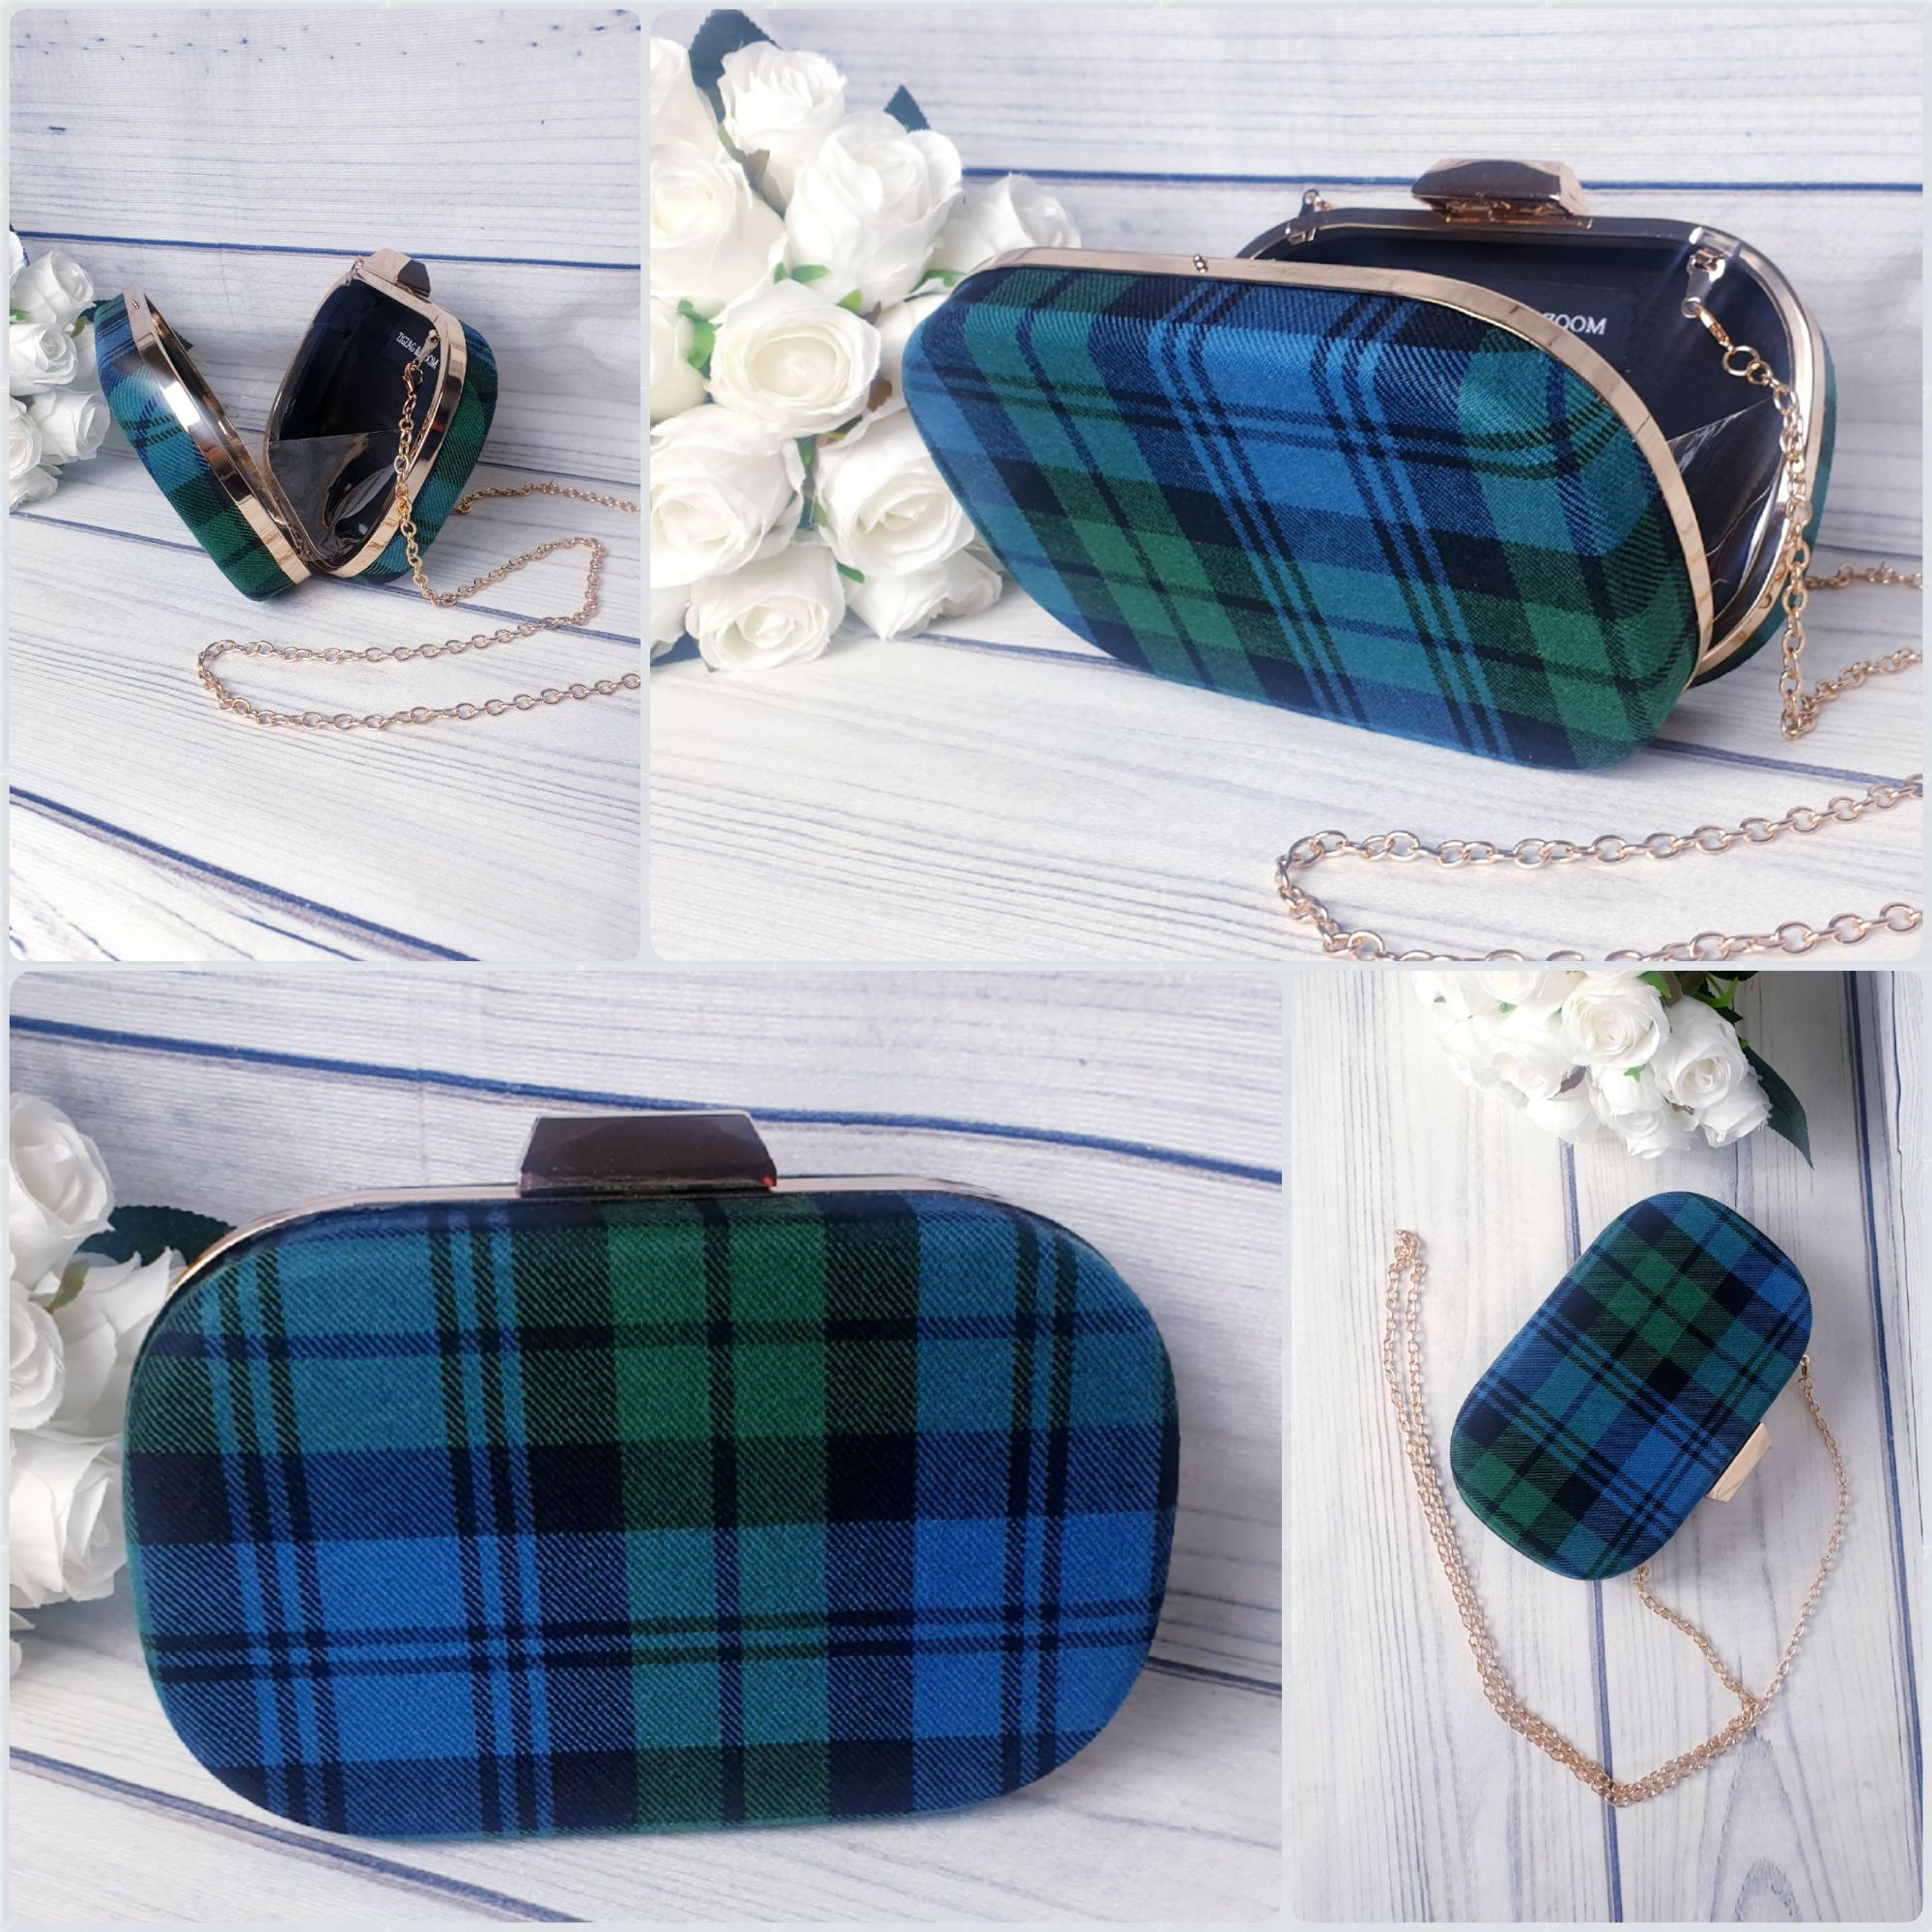 Tartan clutch bag, Ancient Blackwatch tartan